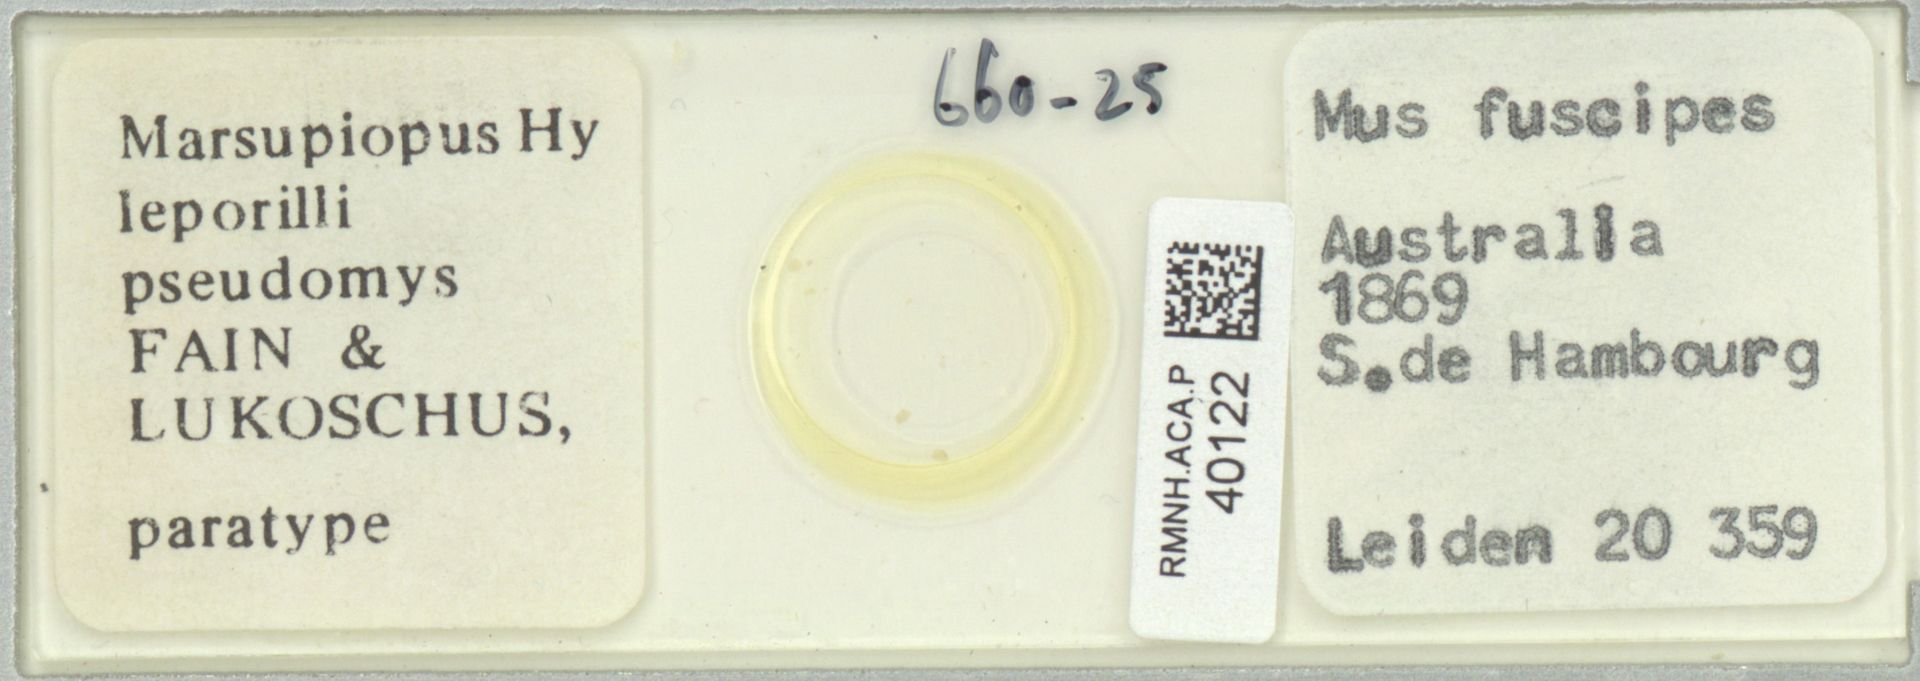 RMNH.ACA.P.40122 | Marsupiopus leporilli pseudomys Fain & Lukoschus